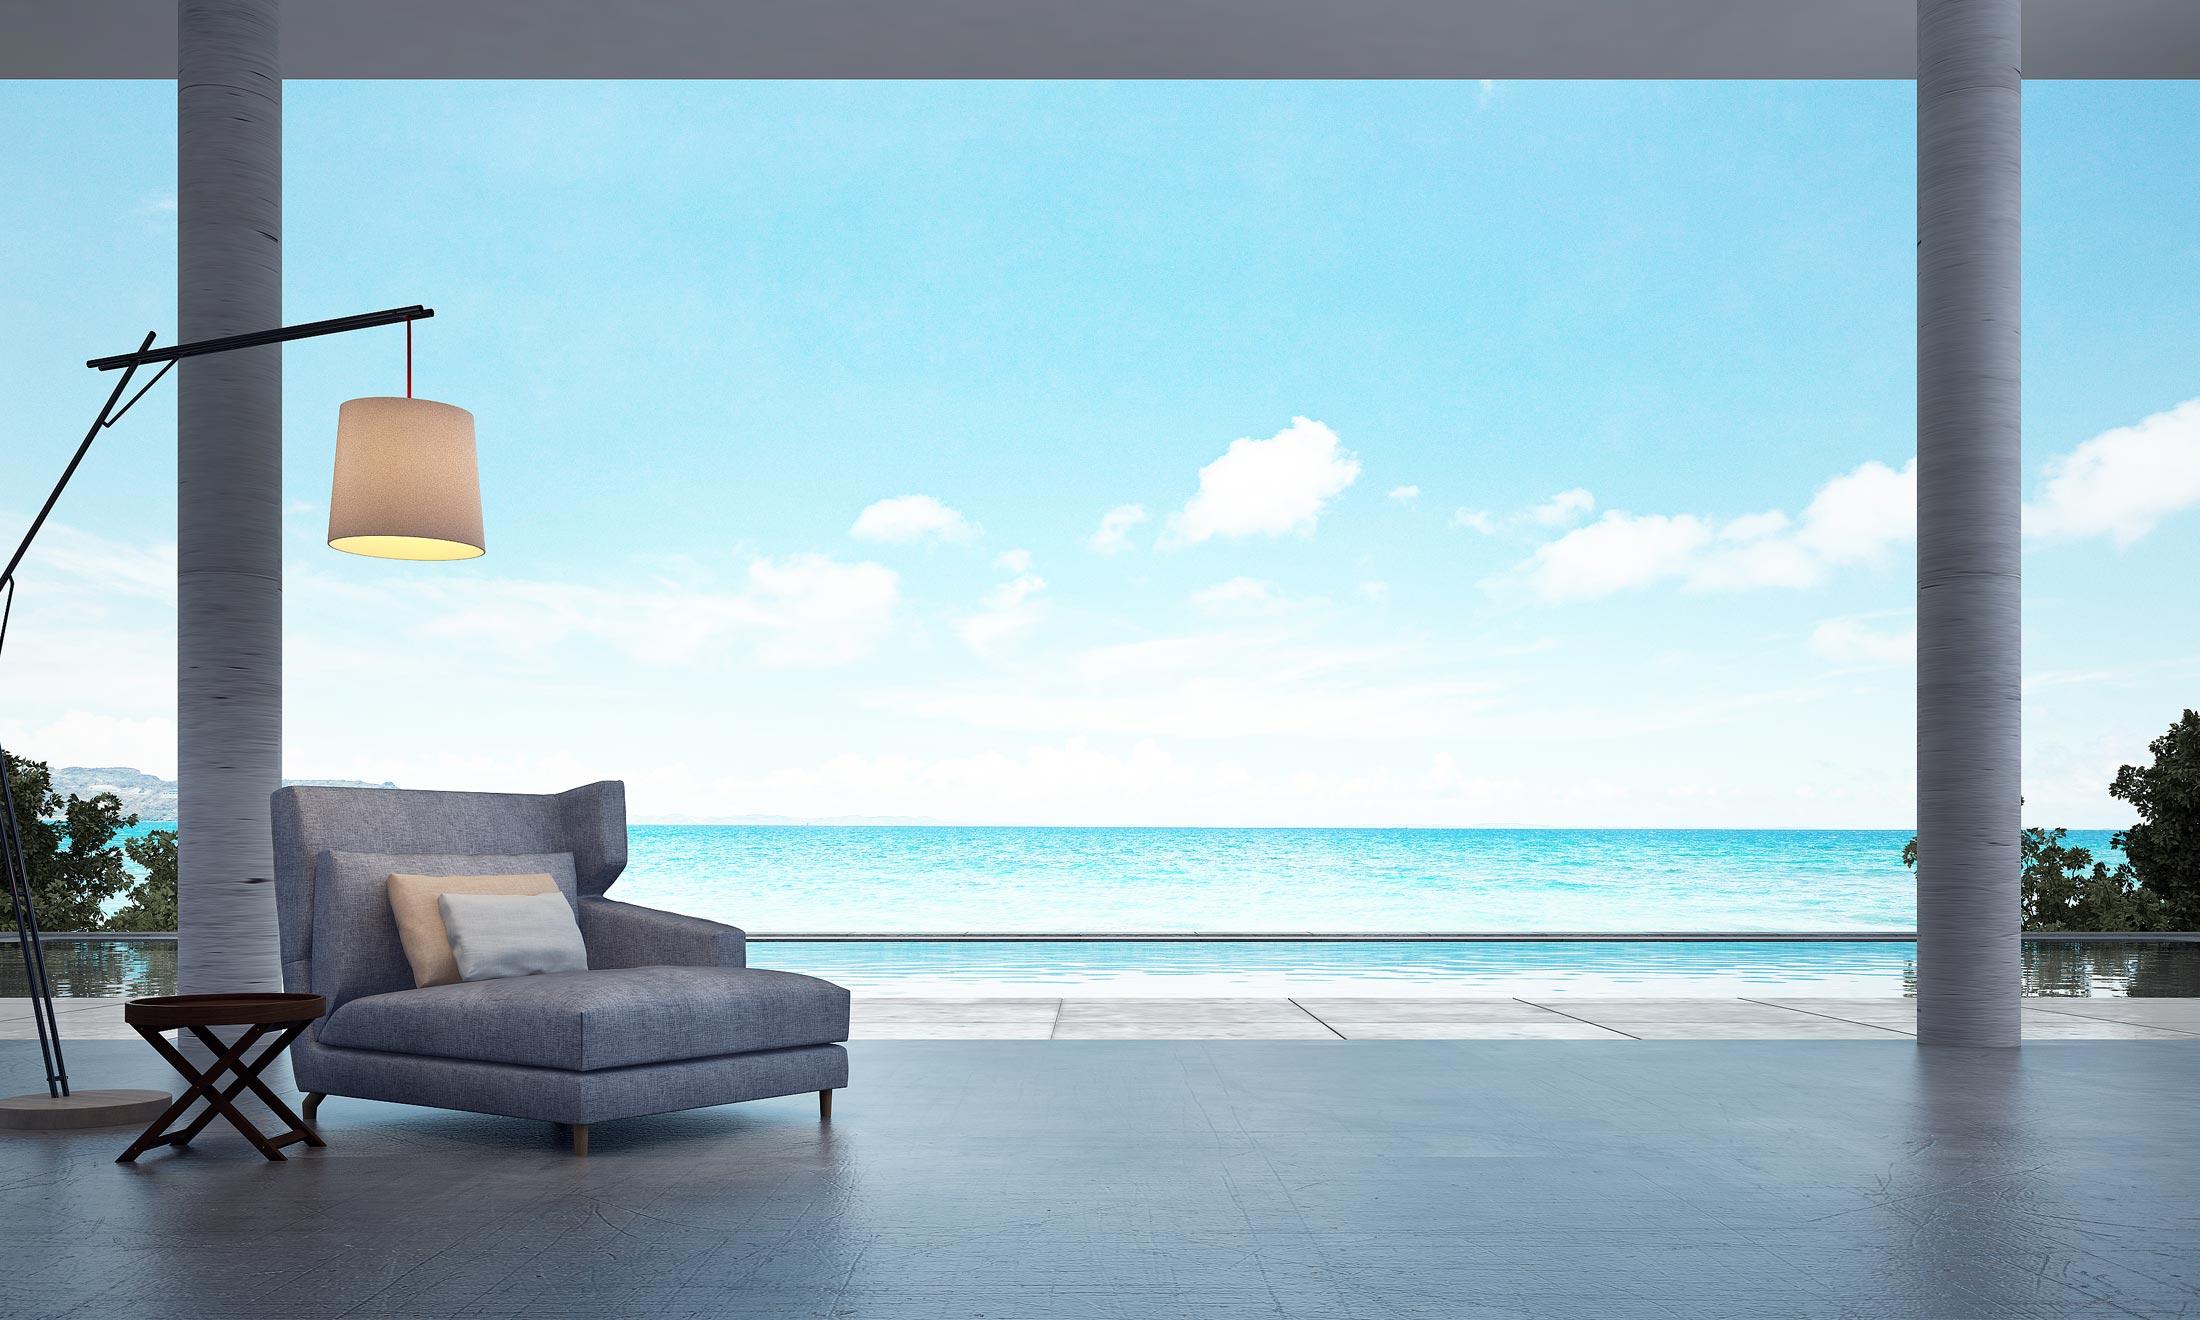 property sales costa del sol palm dream estates mijas real estate